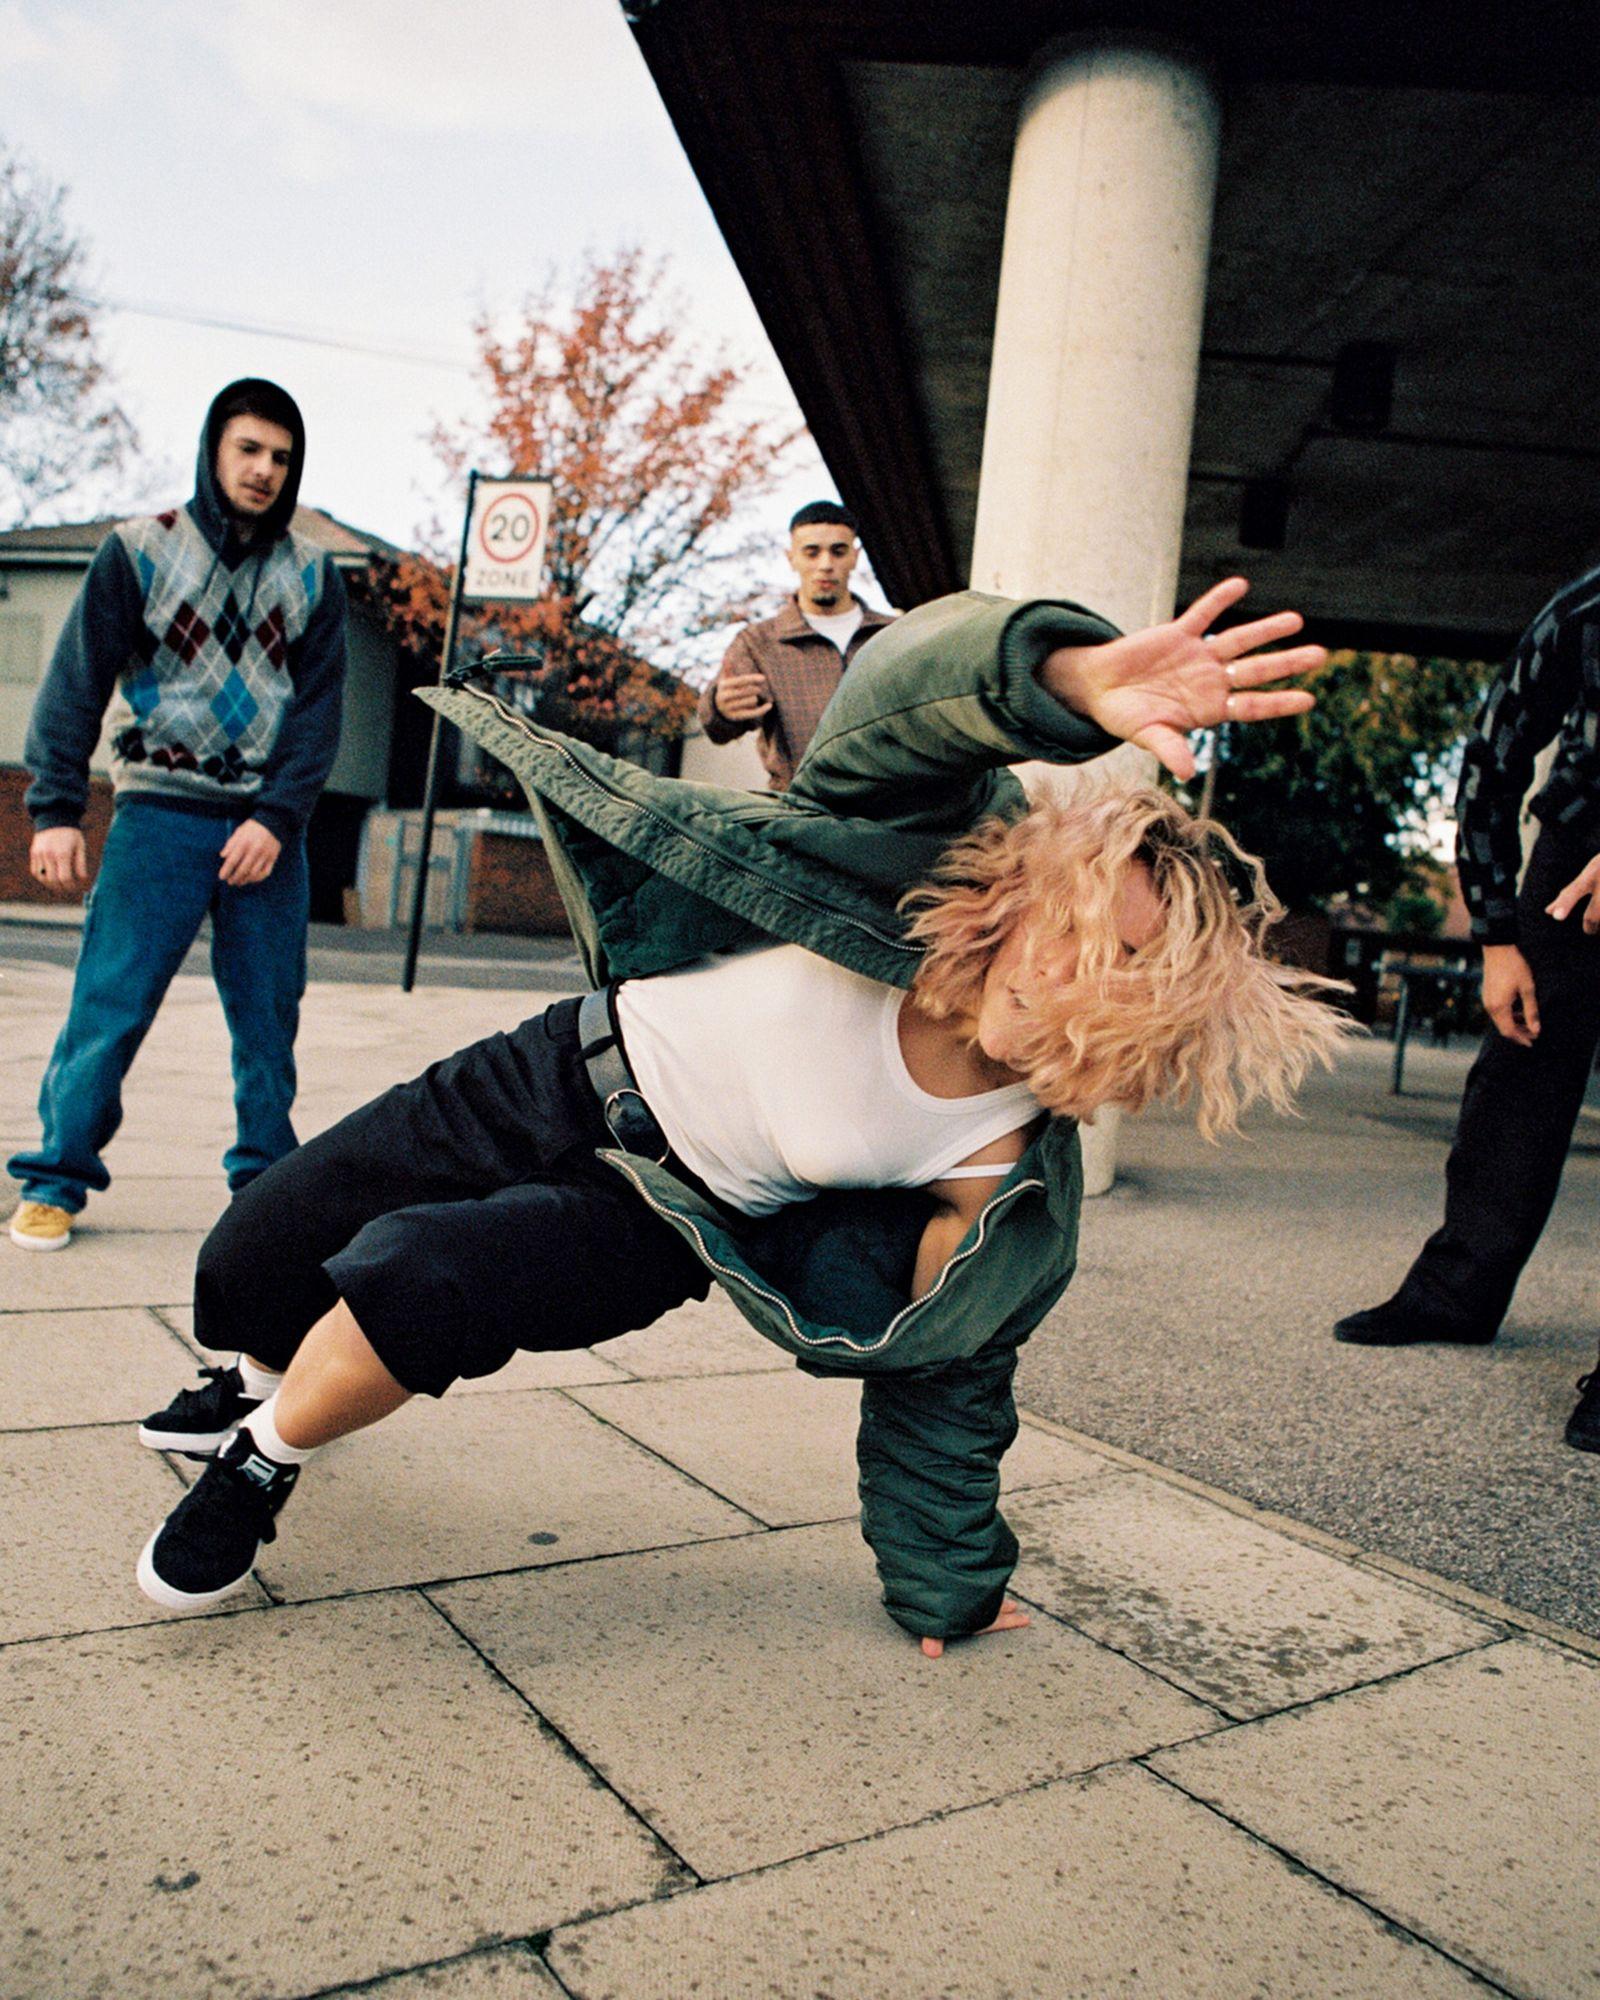 uk-breakers-puma-suede-b-boy-global-dance-sneaker-010